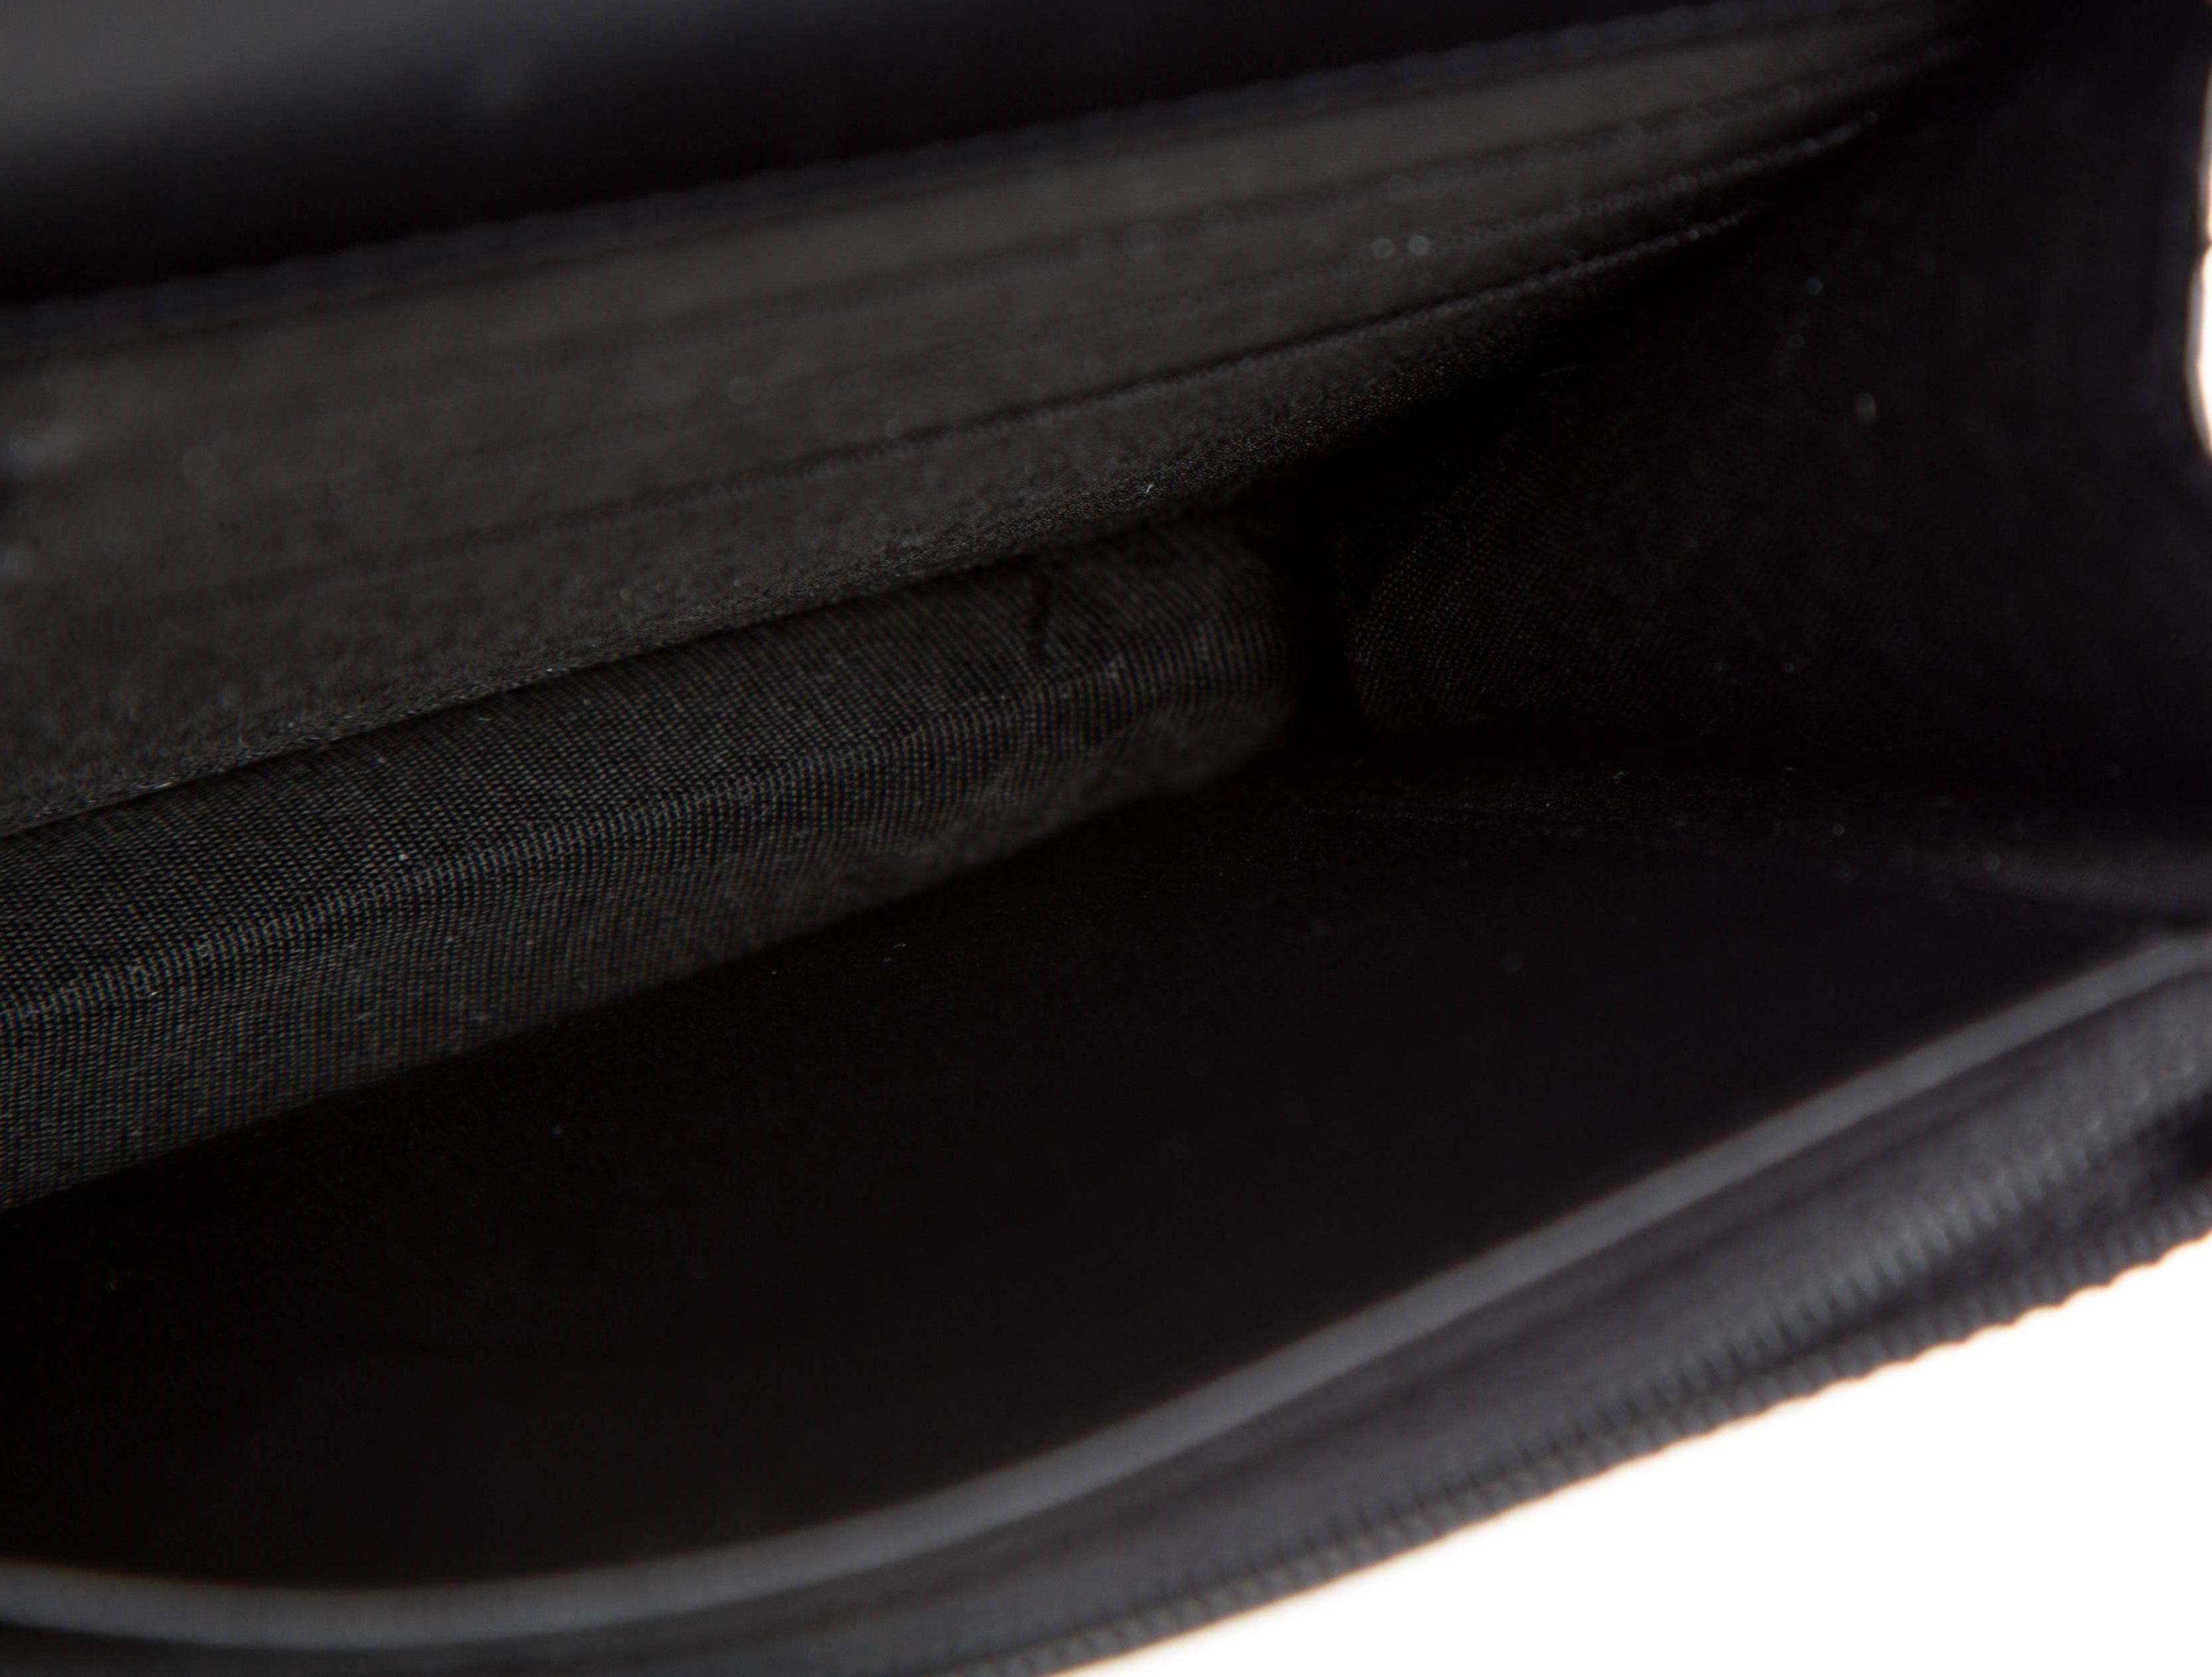 ea368c288ba Chanel Like New Black Gold Python Exotic Leather WOC Shoulder Flap Bag For  Sale at 1stdibs